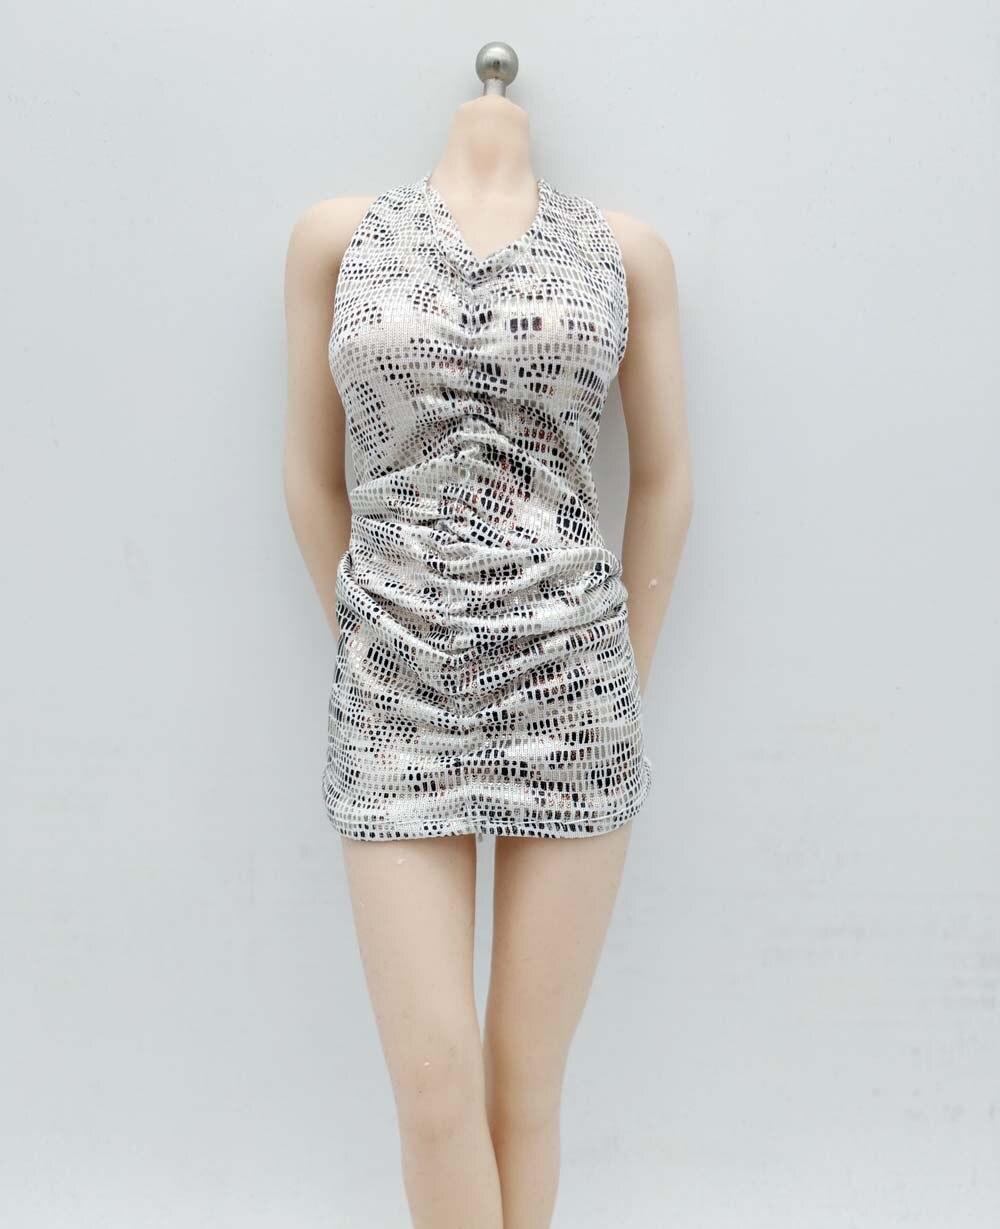 O figura DE ACCIÓN DE Phicen Tbleague JIAUOL de 12 pulgadas, juguete coleccionable a escala 1/6, vestido Sexy brillante, falda, ropa f